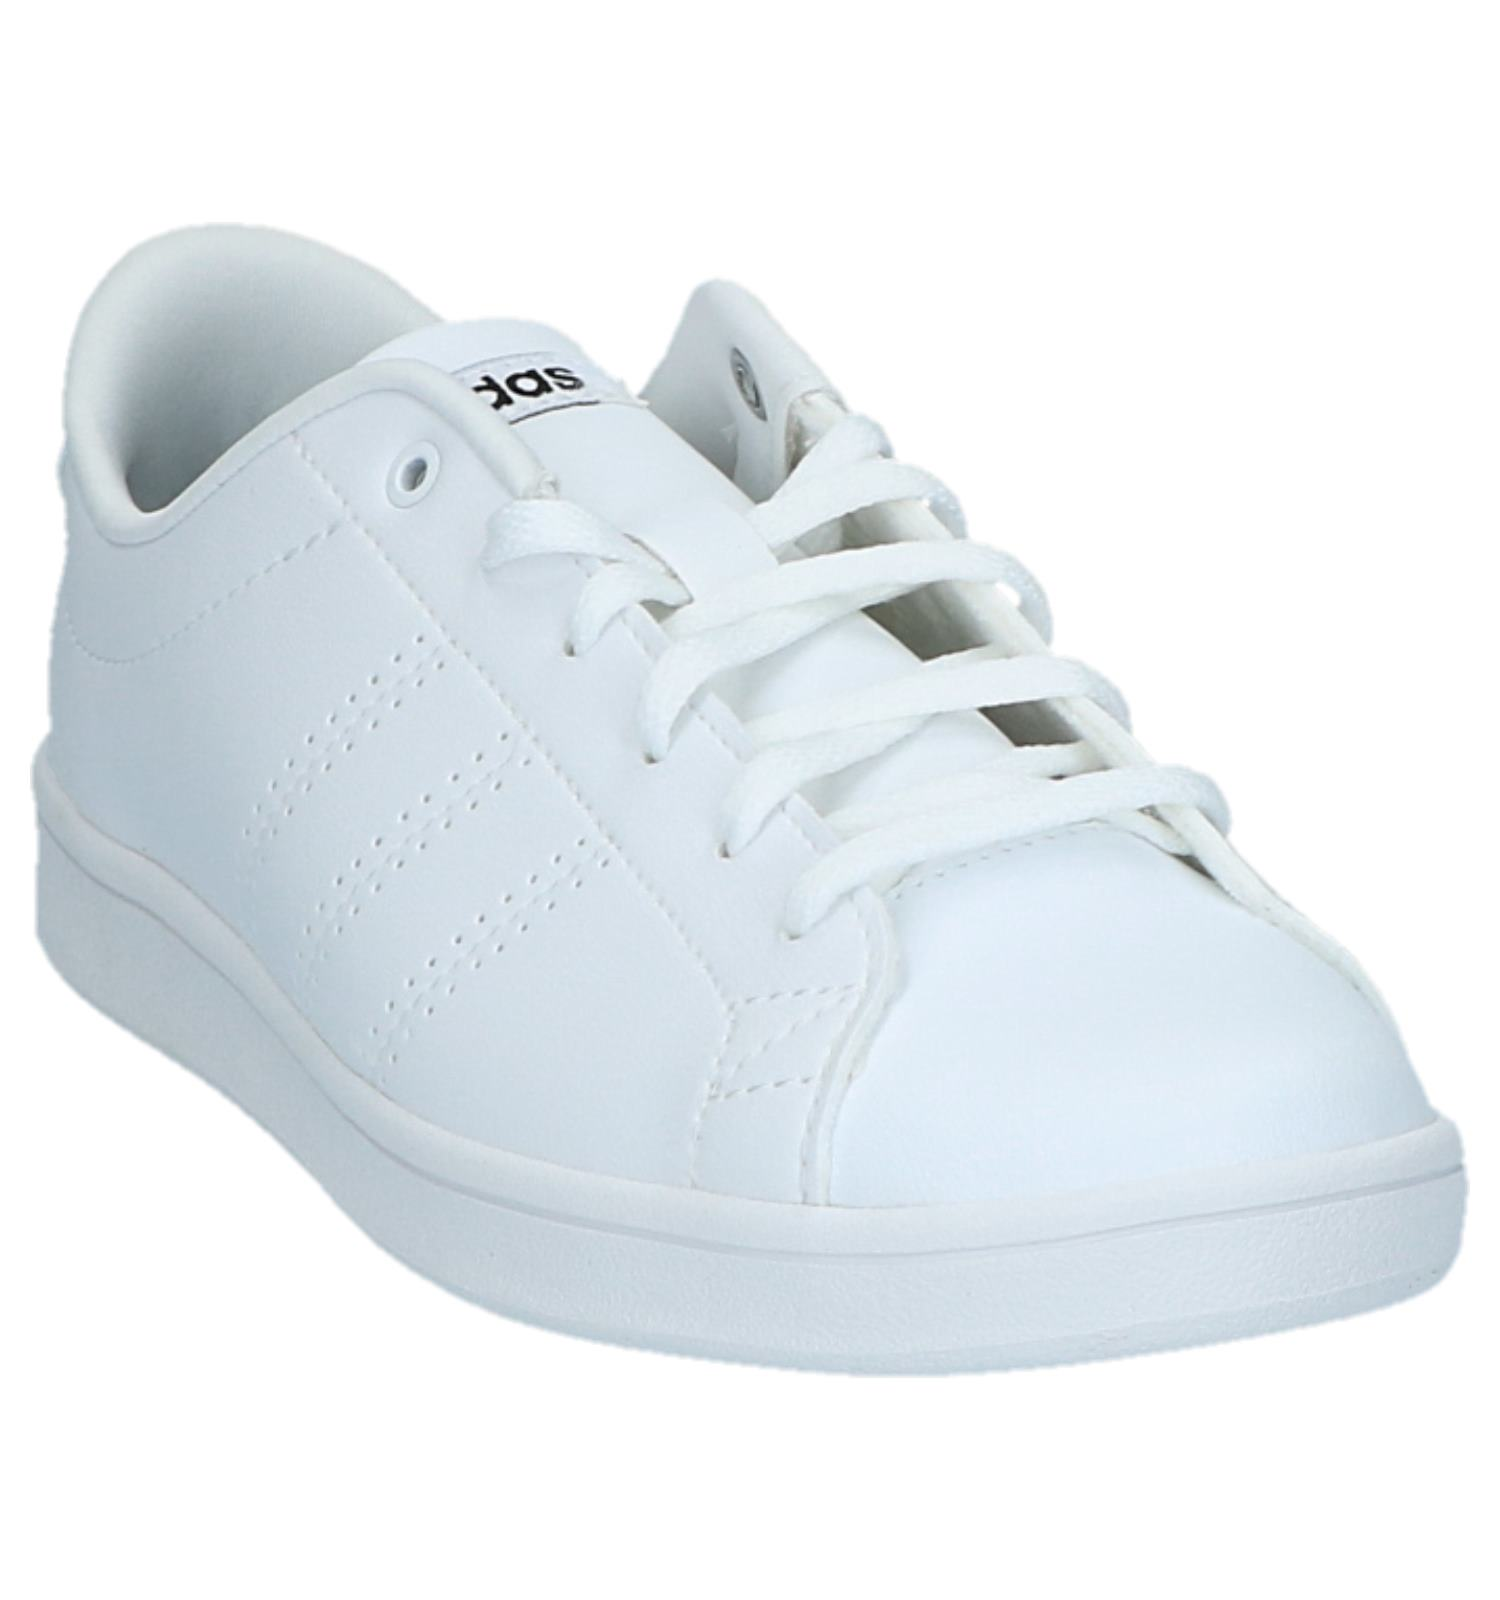 pretty nice 3af2e 525b2 Lage Sportieve Sneakers Wit adidas Advantage Clean  TORFS.BE  Gratis  verzend en retour